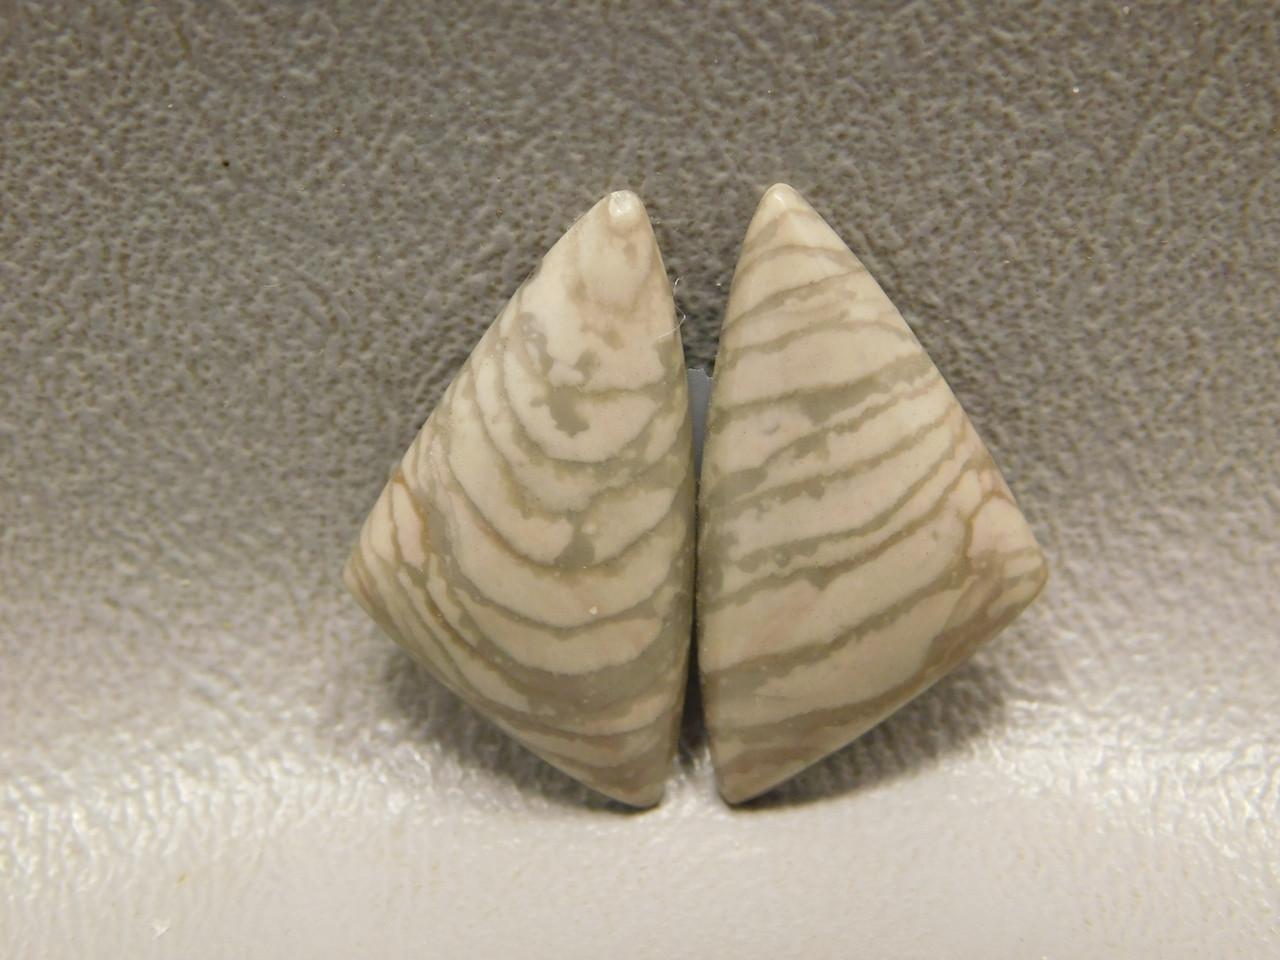 Cabochon Semiprecious Stones Willow Creek Jasper Matched Pair #18